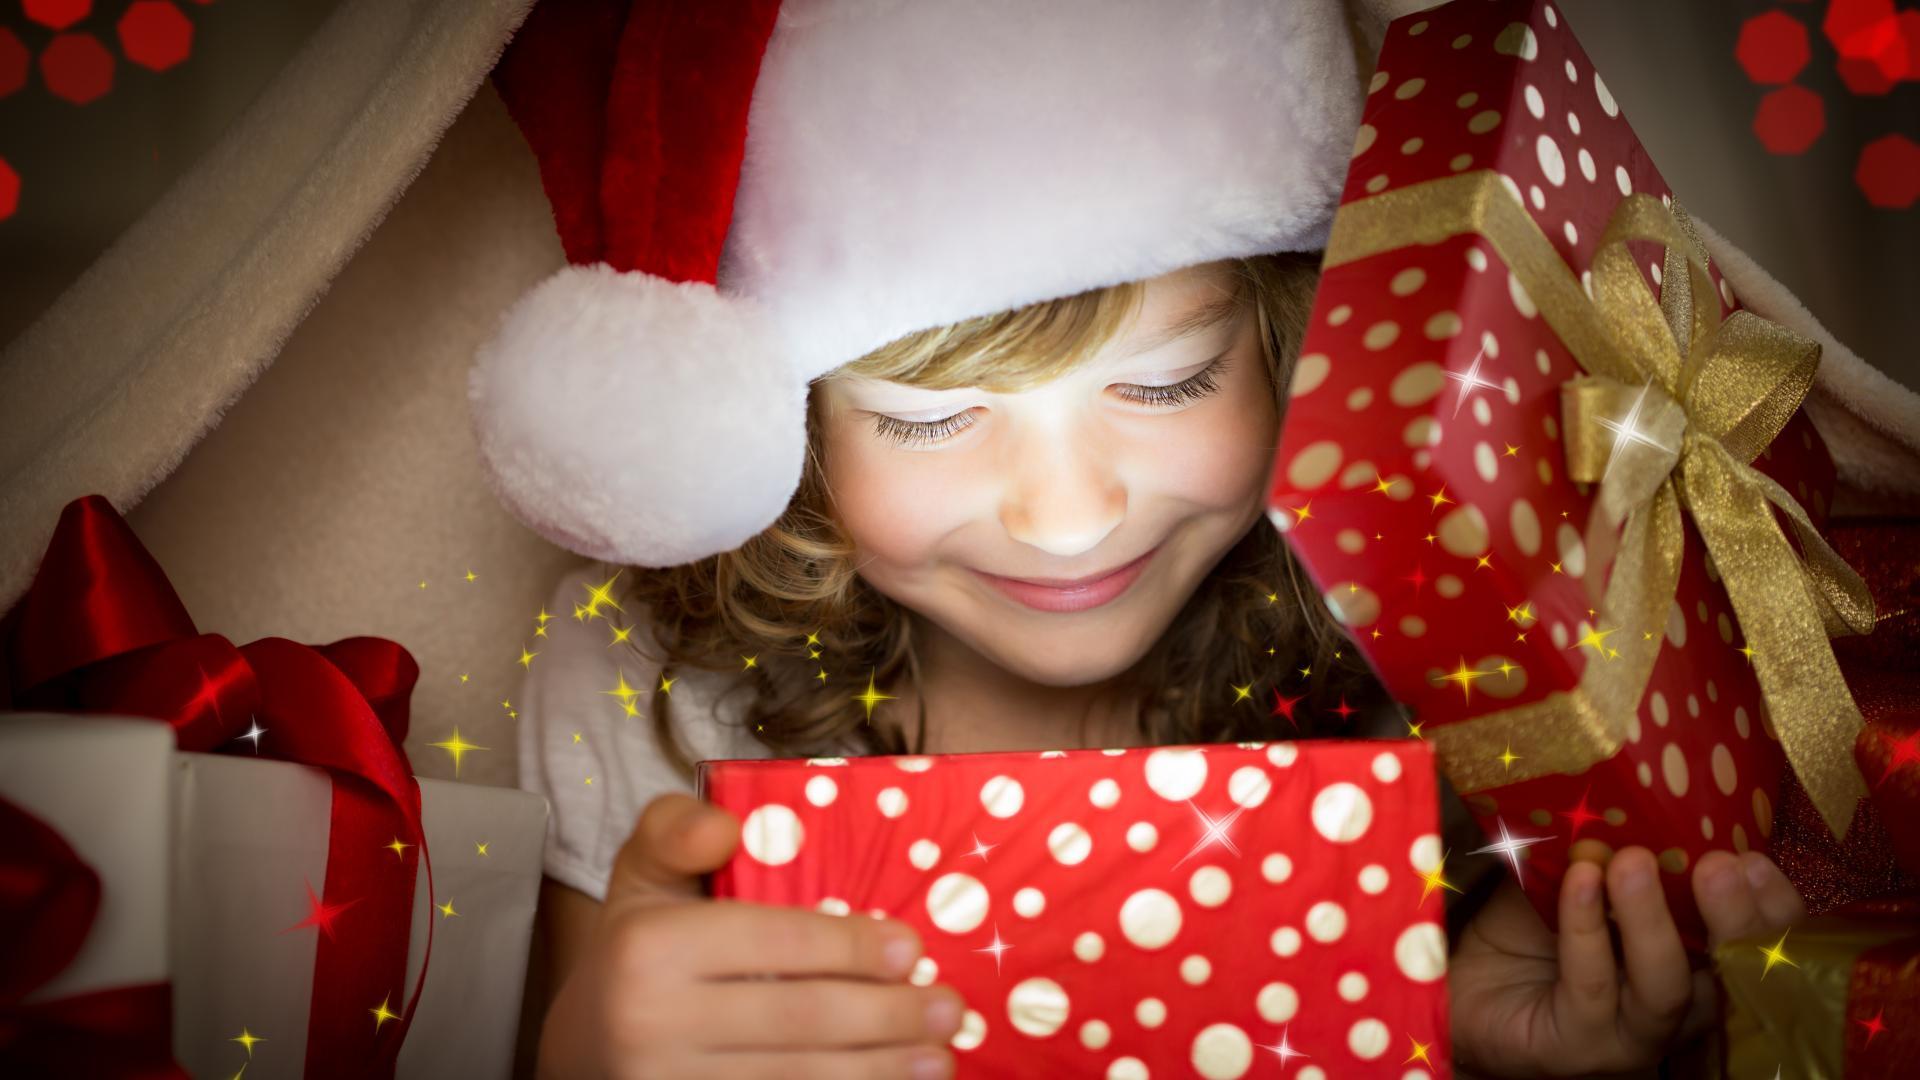 Songs to Invoke Christmas 2